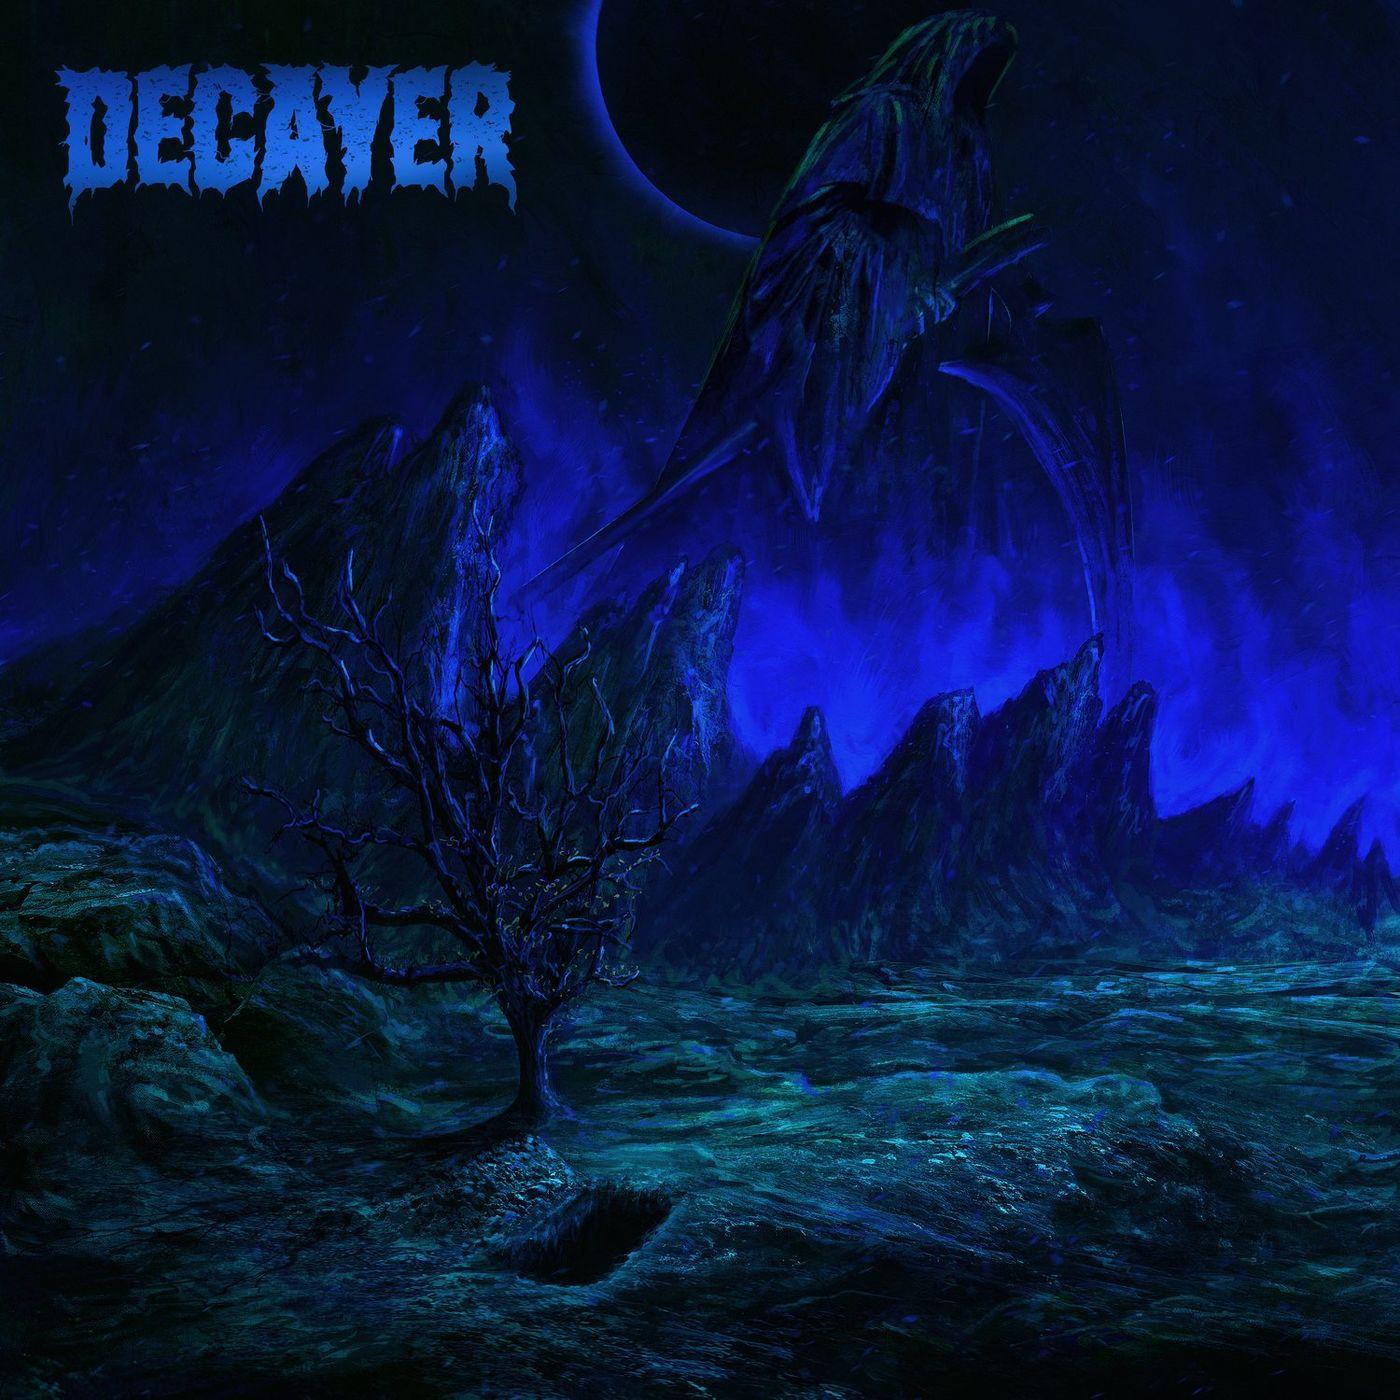 Decayer - Talented Sun [single] (2020)